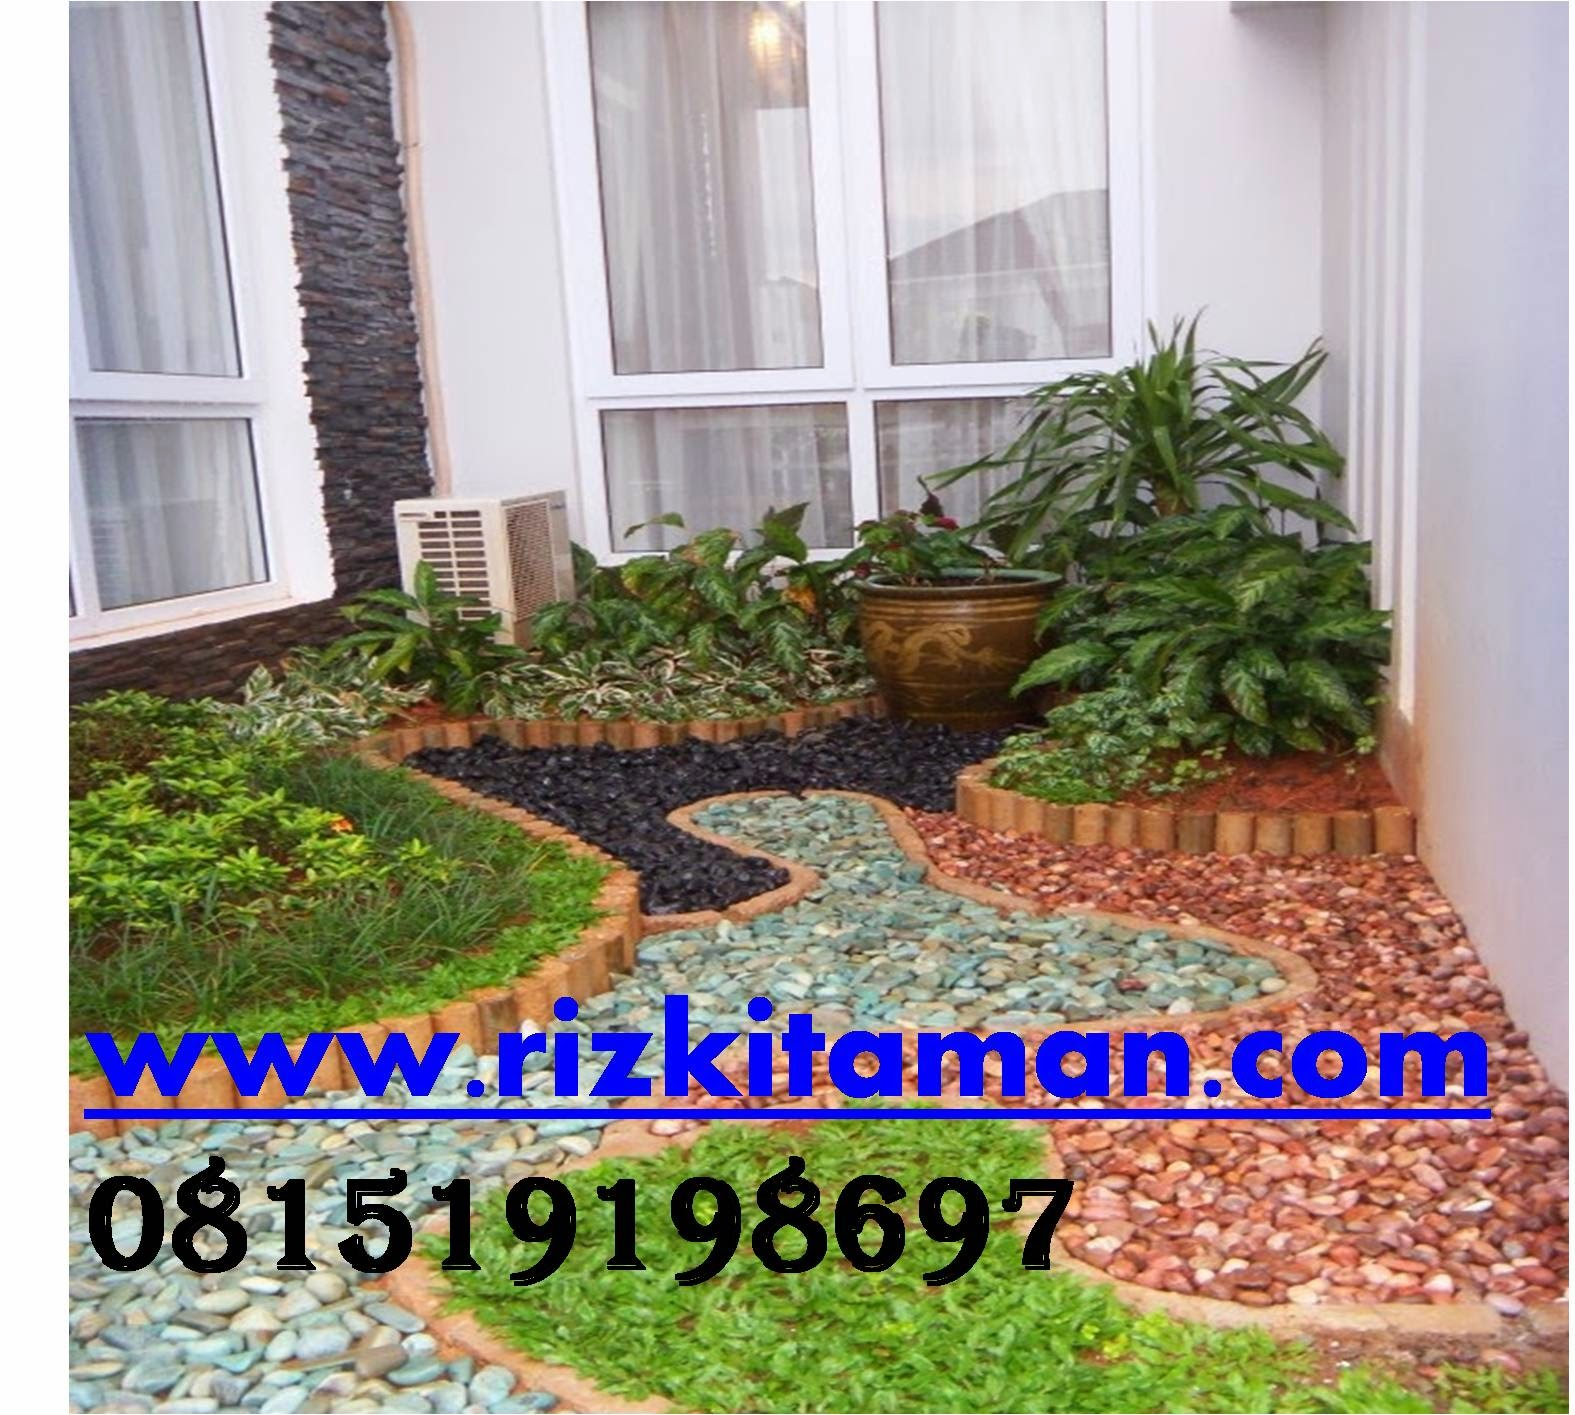 Tukang taman minimalis | jasa pembuatan taman dan penanaman rumput taman